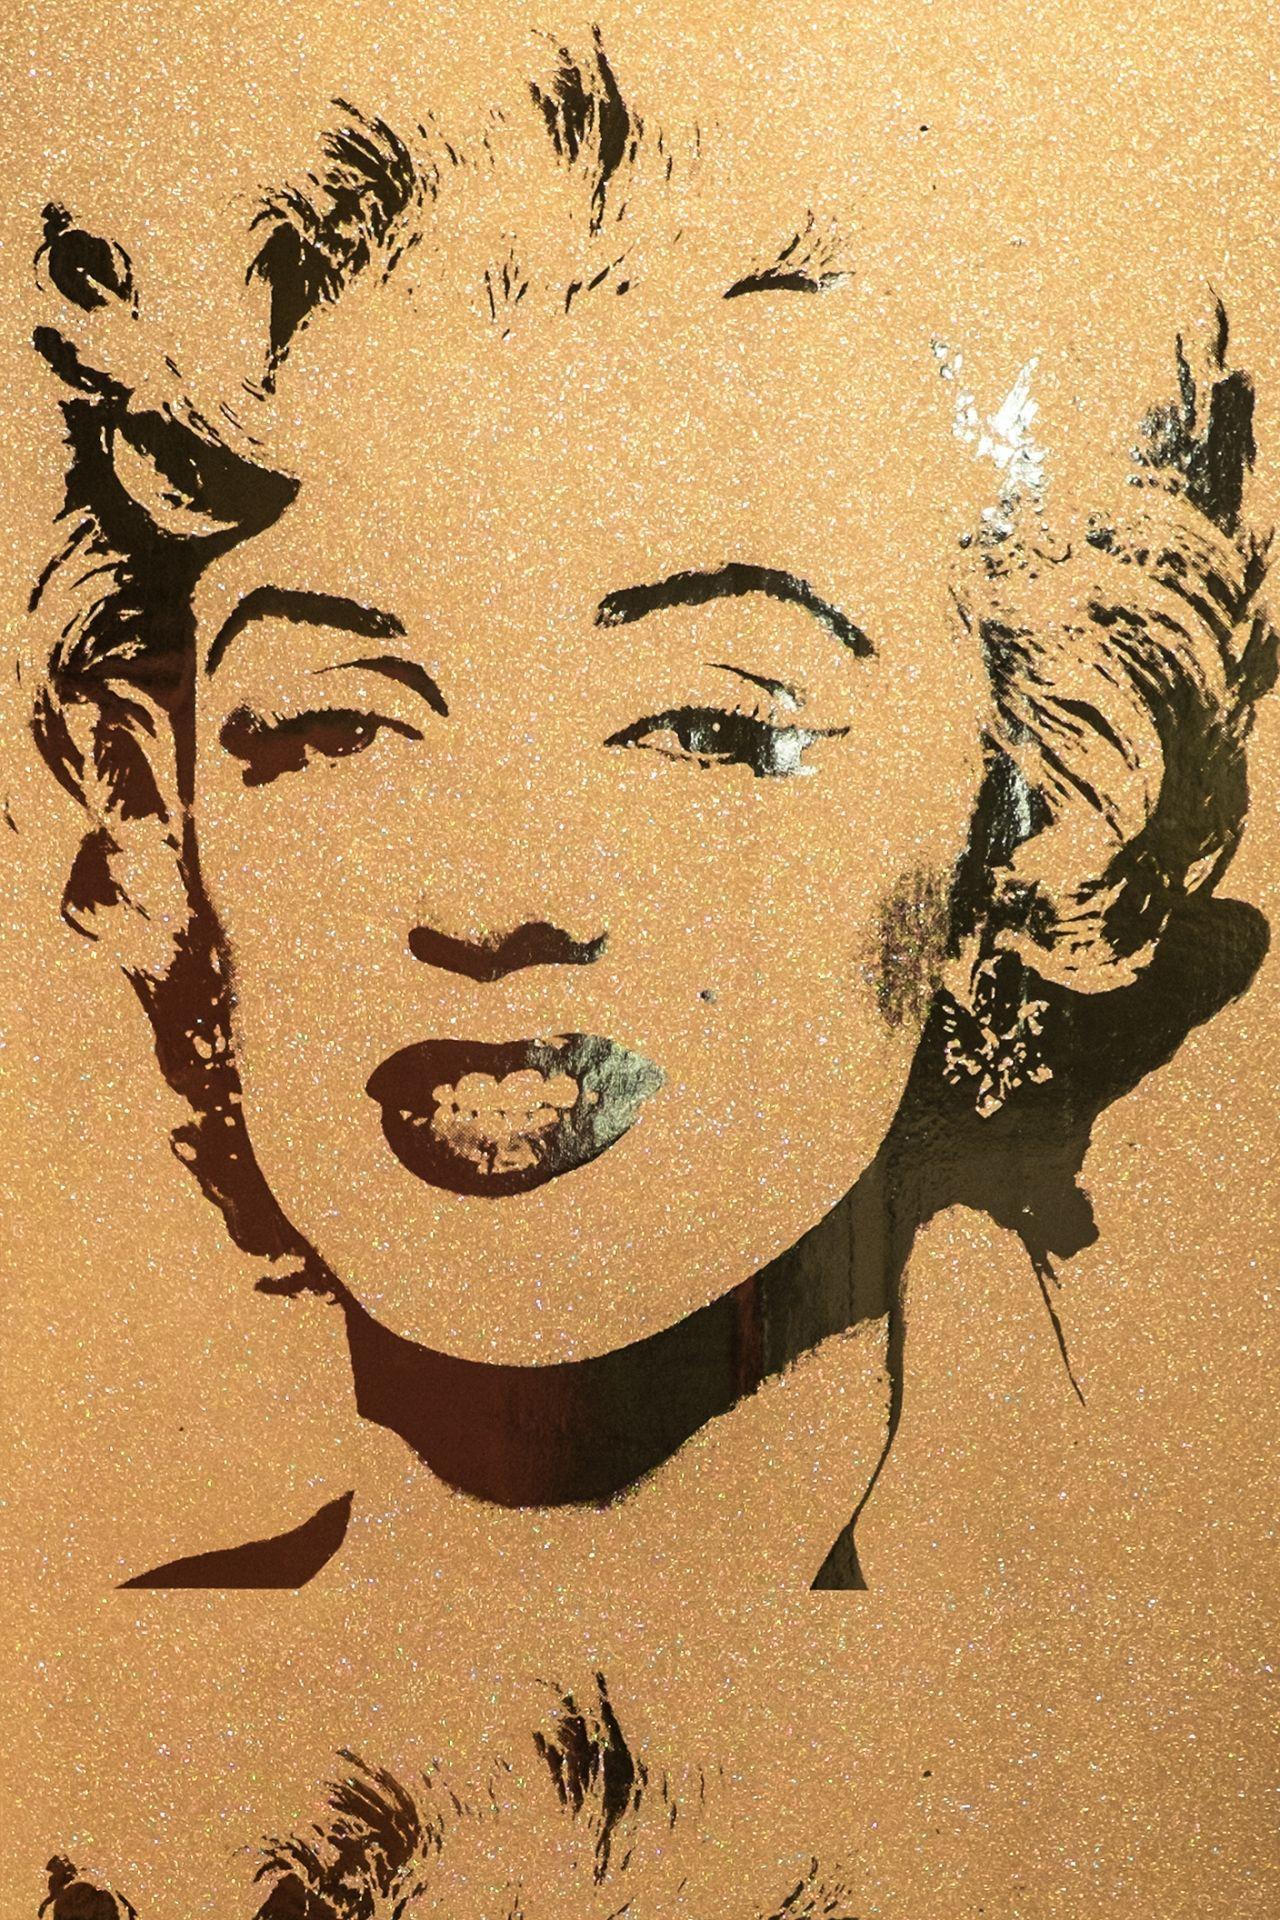 Flavor Paper Andy Warhol Marilyn Monroe Wallpaper Gold Diamond